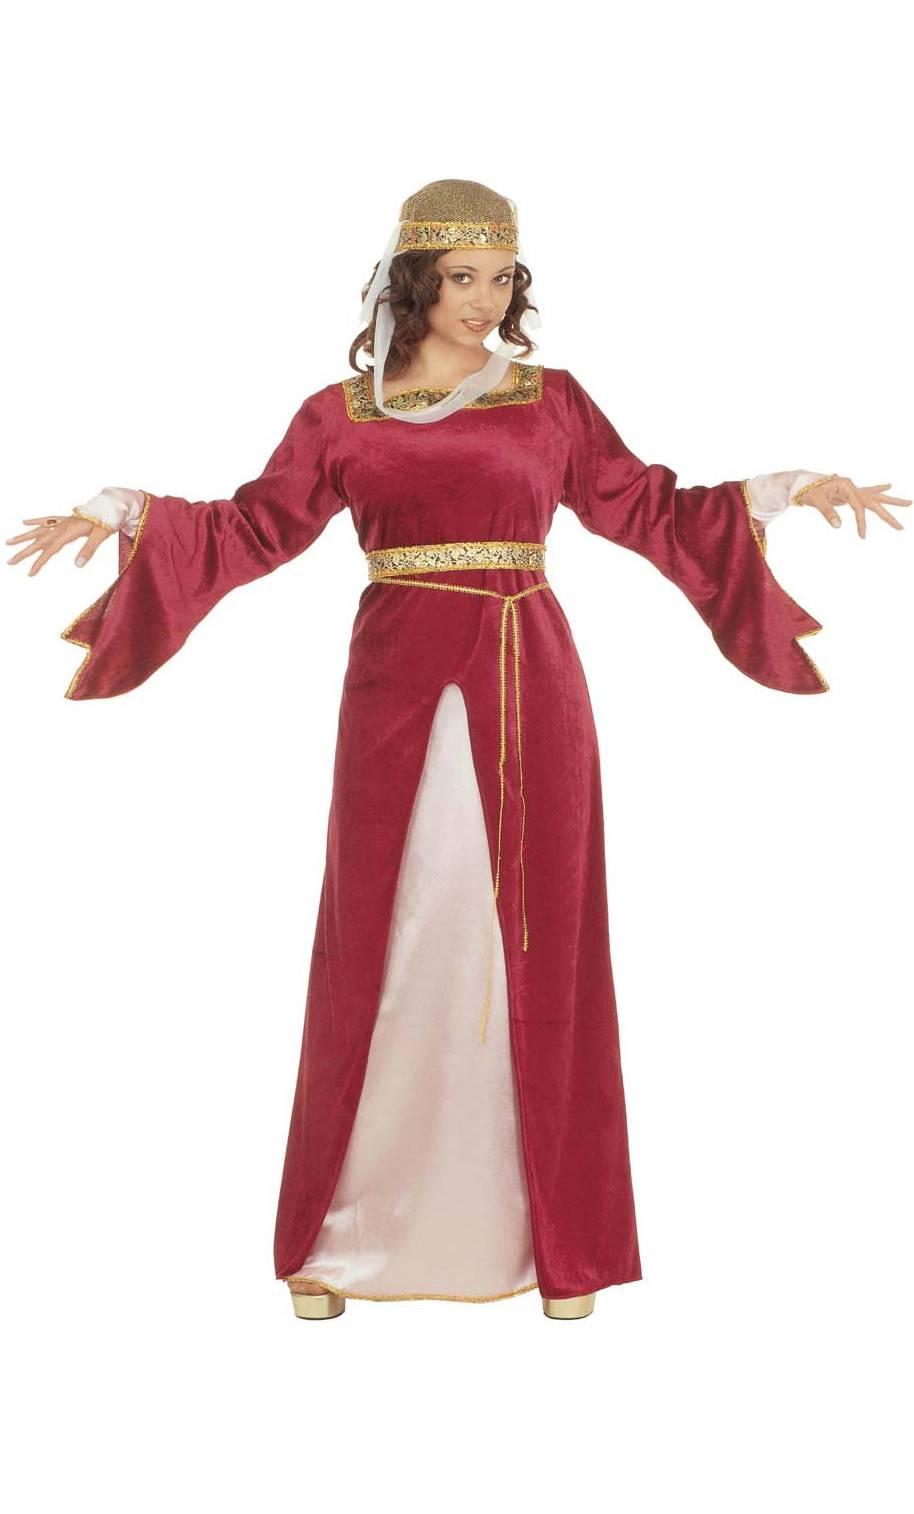 Costume-Méviévale-Grande-Taille-XL-2